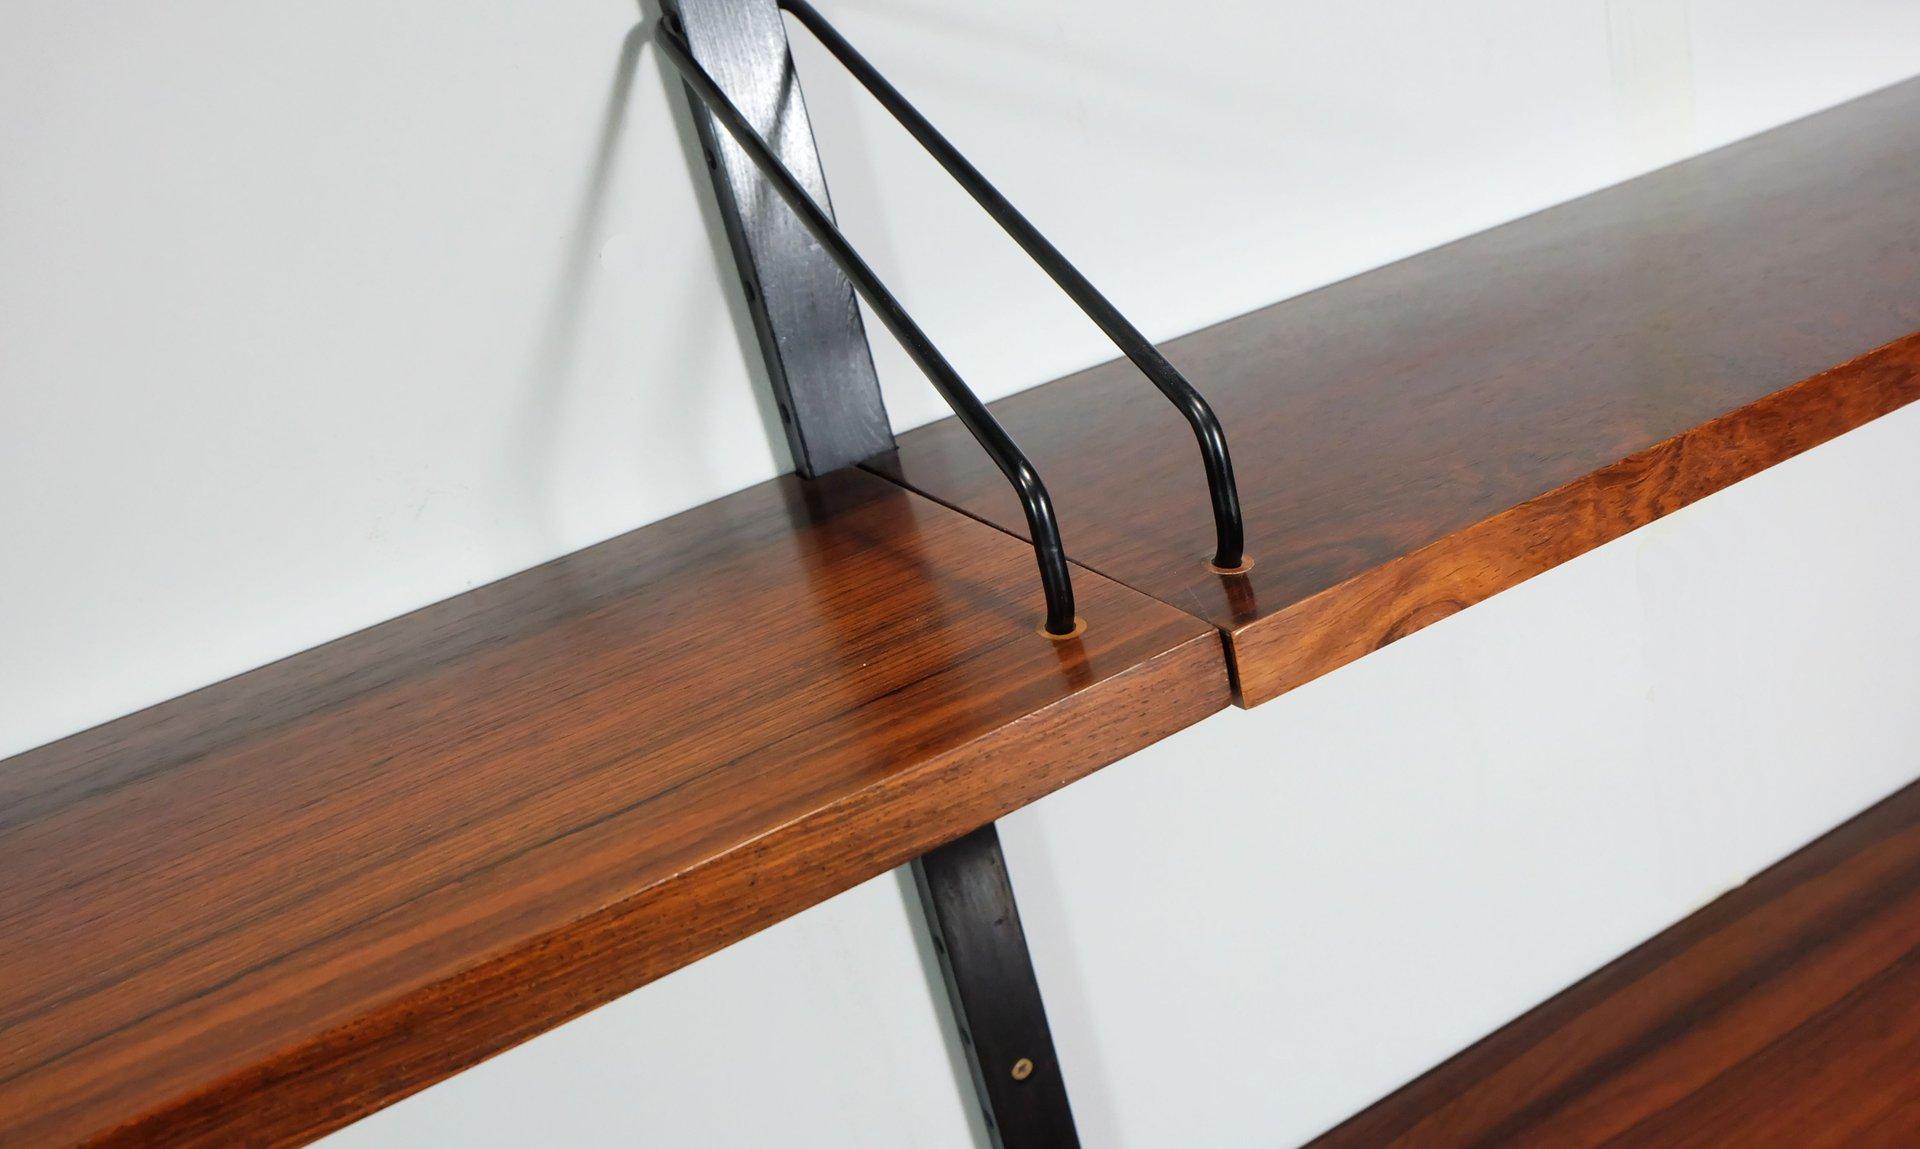 regalwand von poul cadovius f r royal system ca 1960er bei pamono kaufen. Black Bedroom Furniture Sets. Home Design Ideas